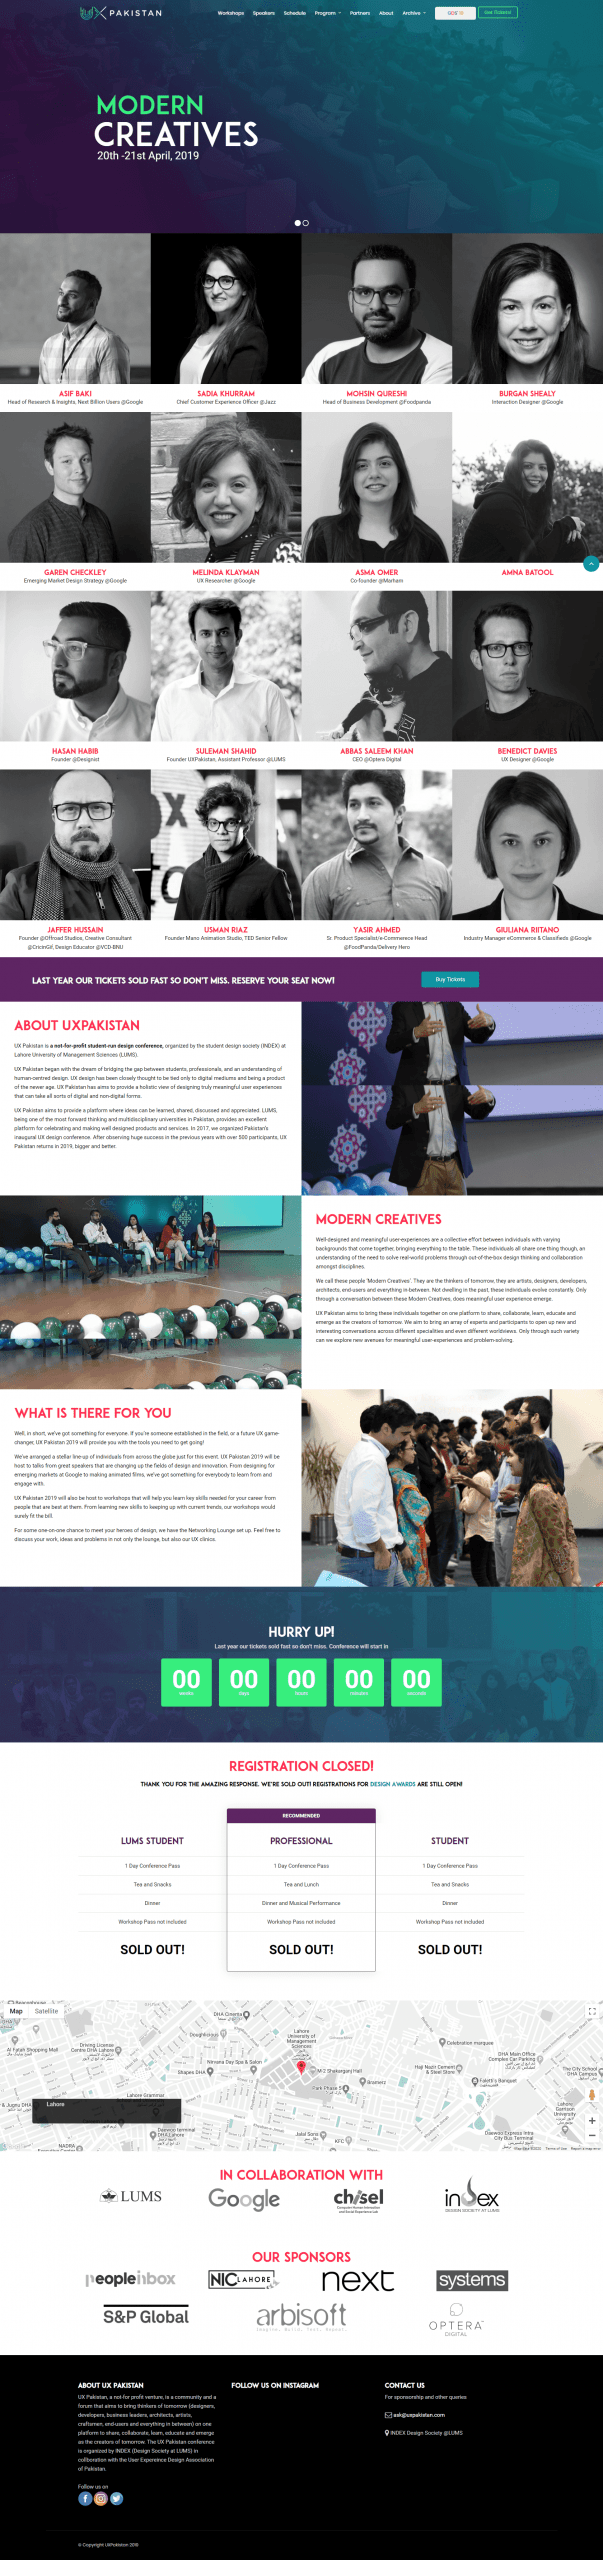 UX Pakistan 2019 Landing Page